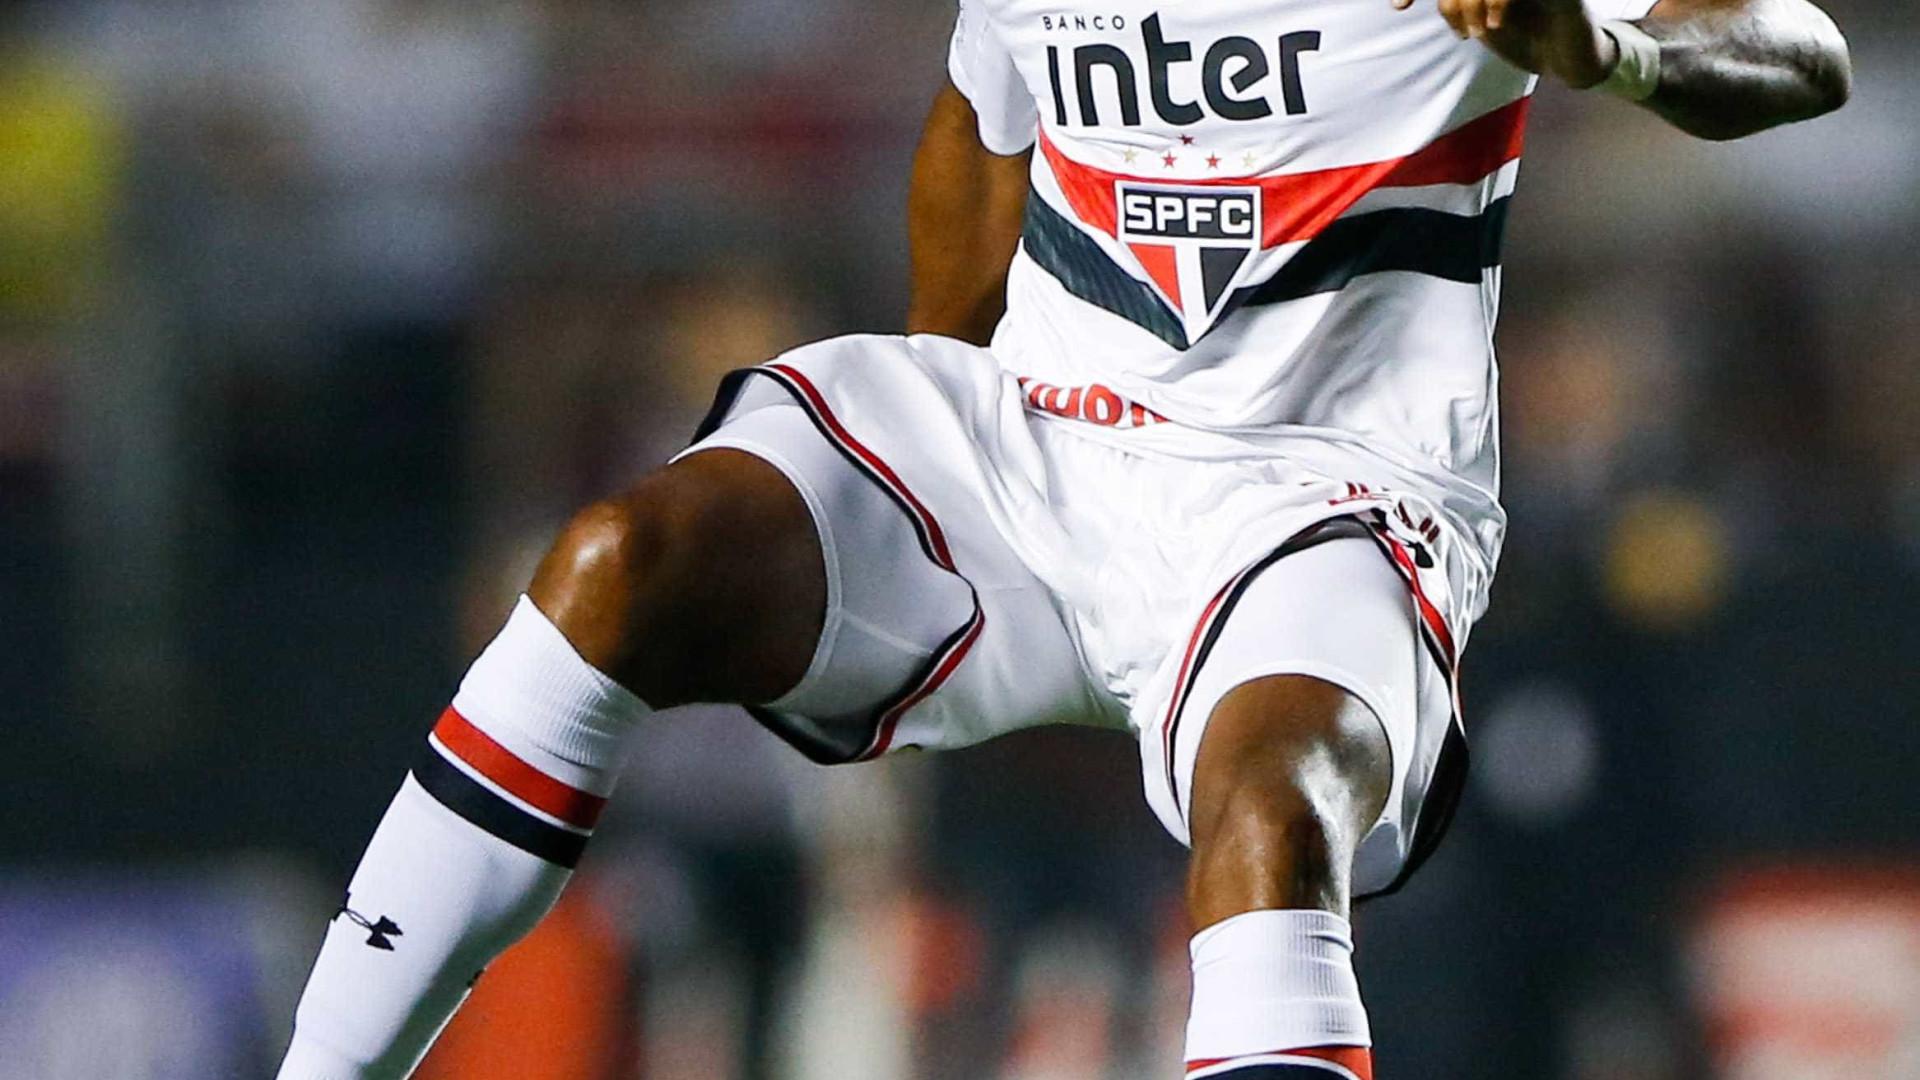 Lesionado, Jucilei vai desfalcar o São Paulo contra o Corinthians